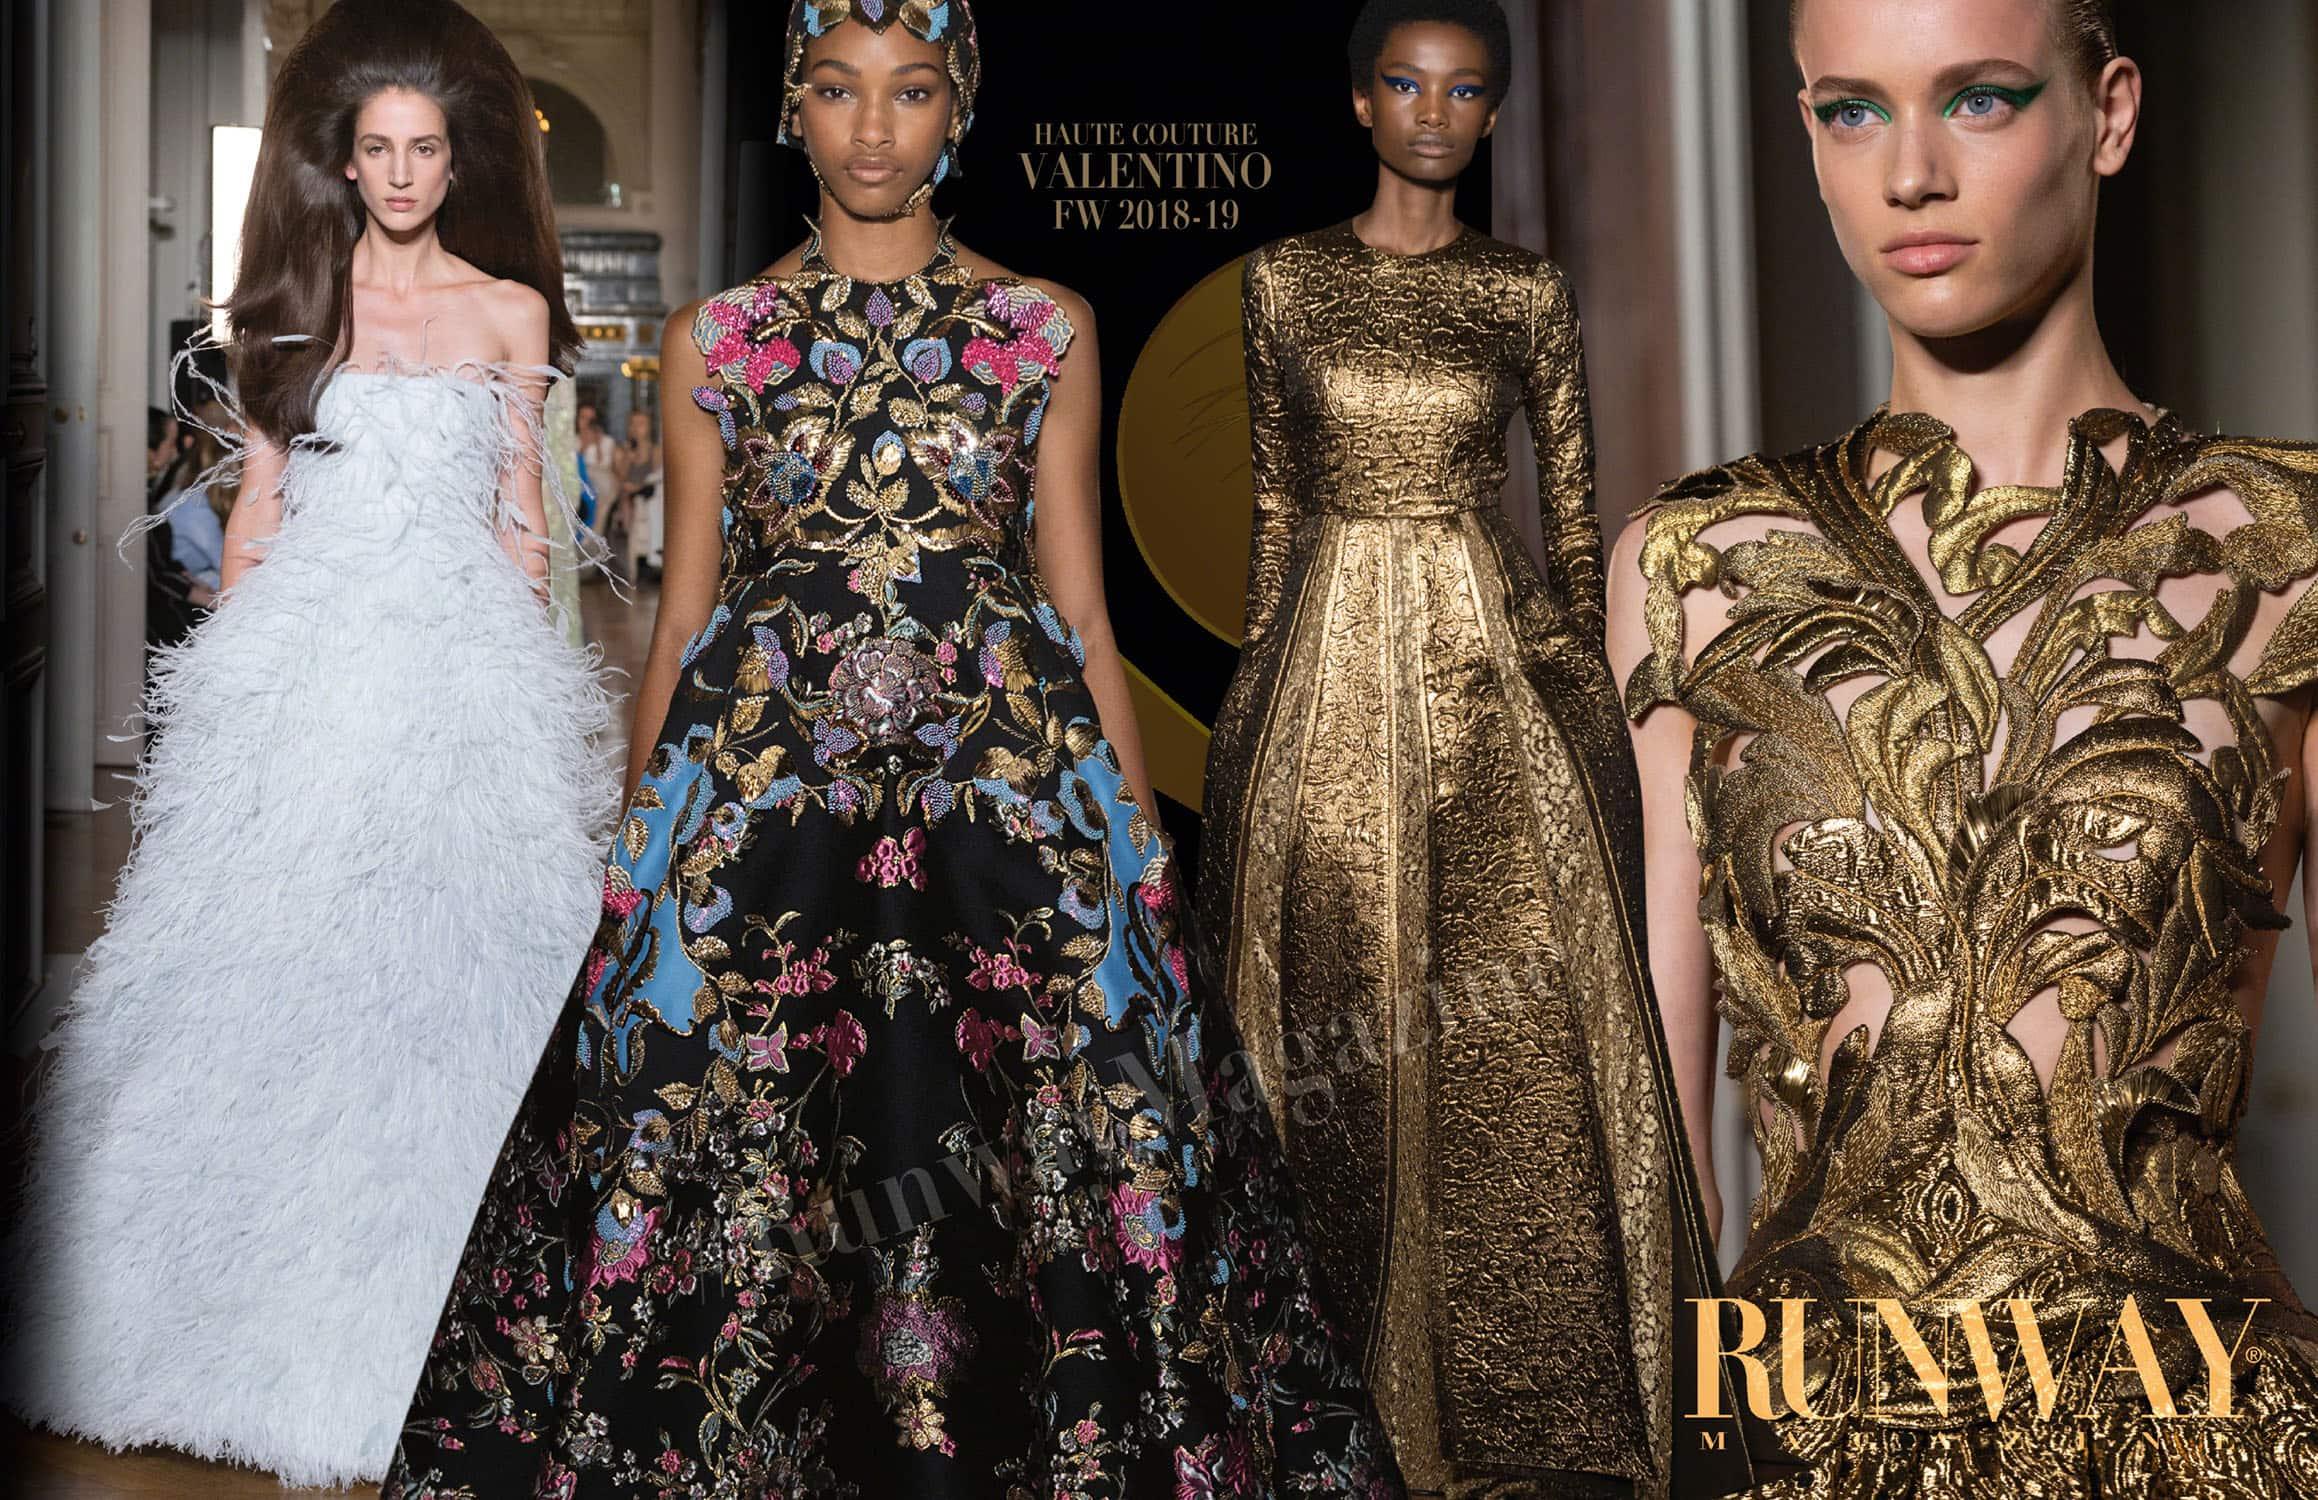 Неделя моды в Париже осень-зима 2018-19 от Valentino Haute Couture, автор: RUNWAY ЖУРНАЛ